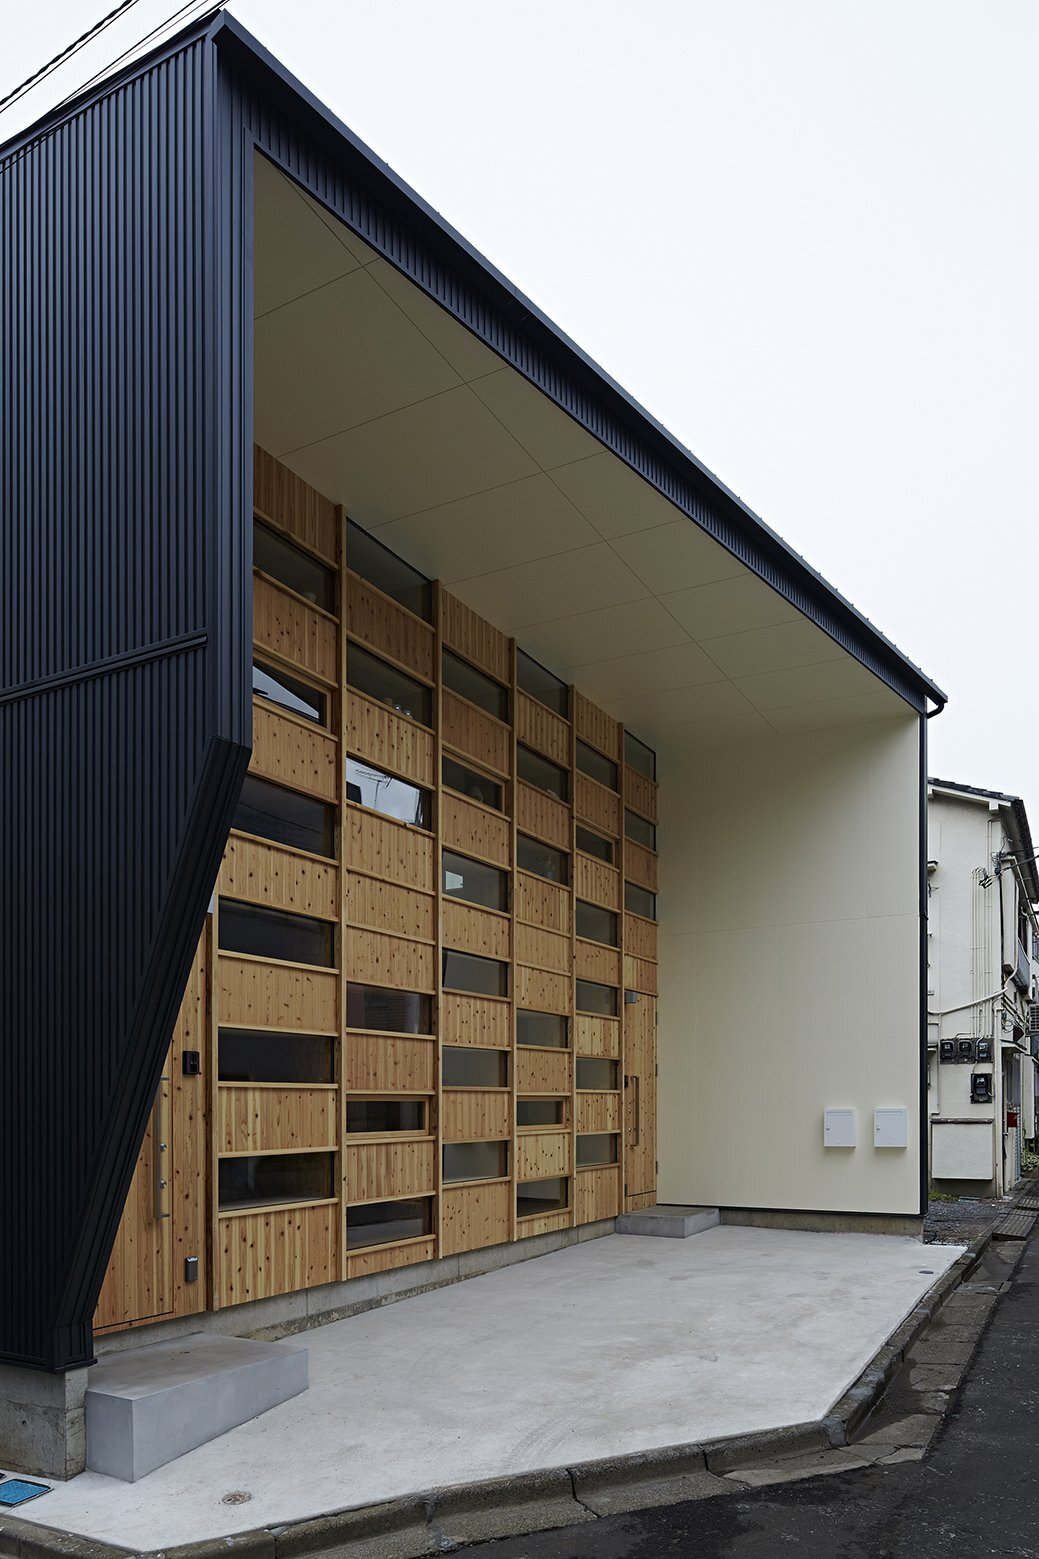 Checkered House - Takeshi Shikauchi Architect Office - Tokyo - Exterior - Humble Homes